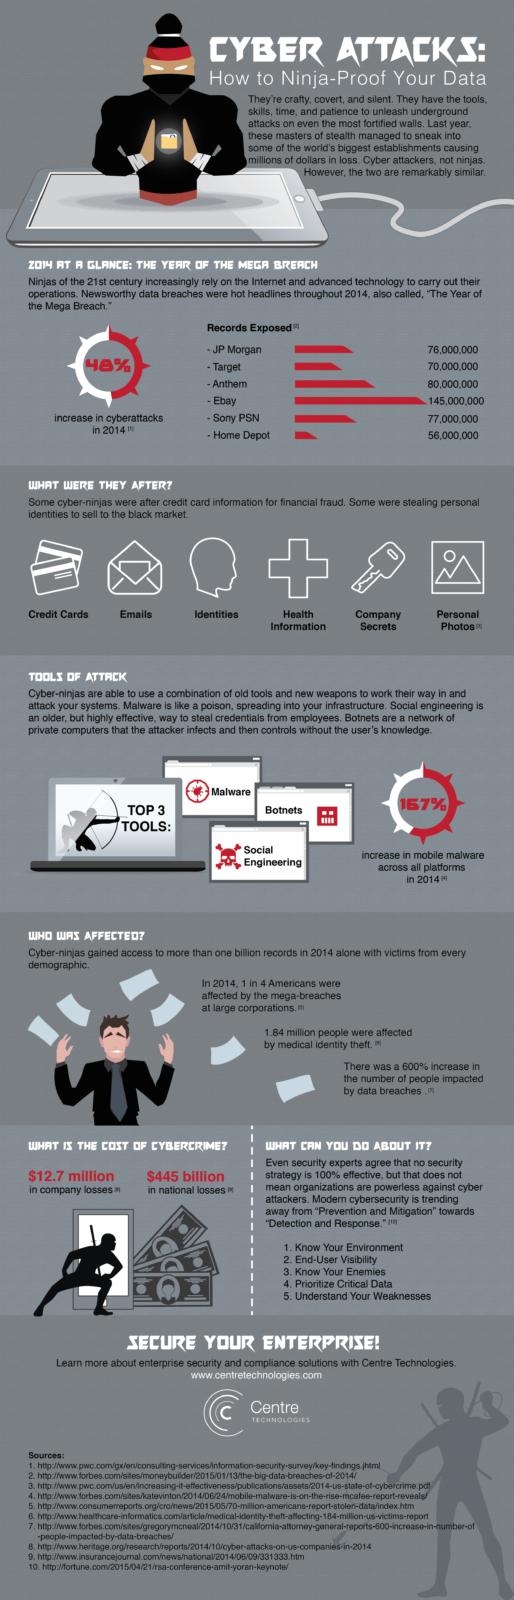 Ninja-Proof Your Data Infographic - Cybersecurity